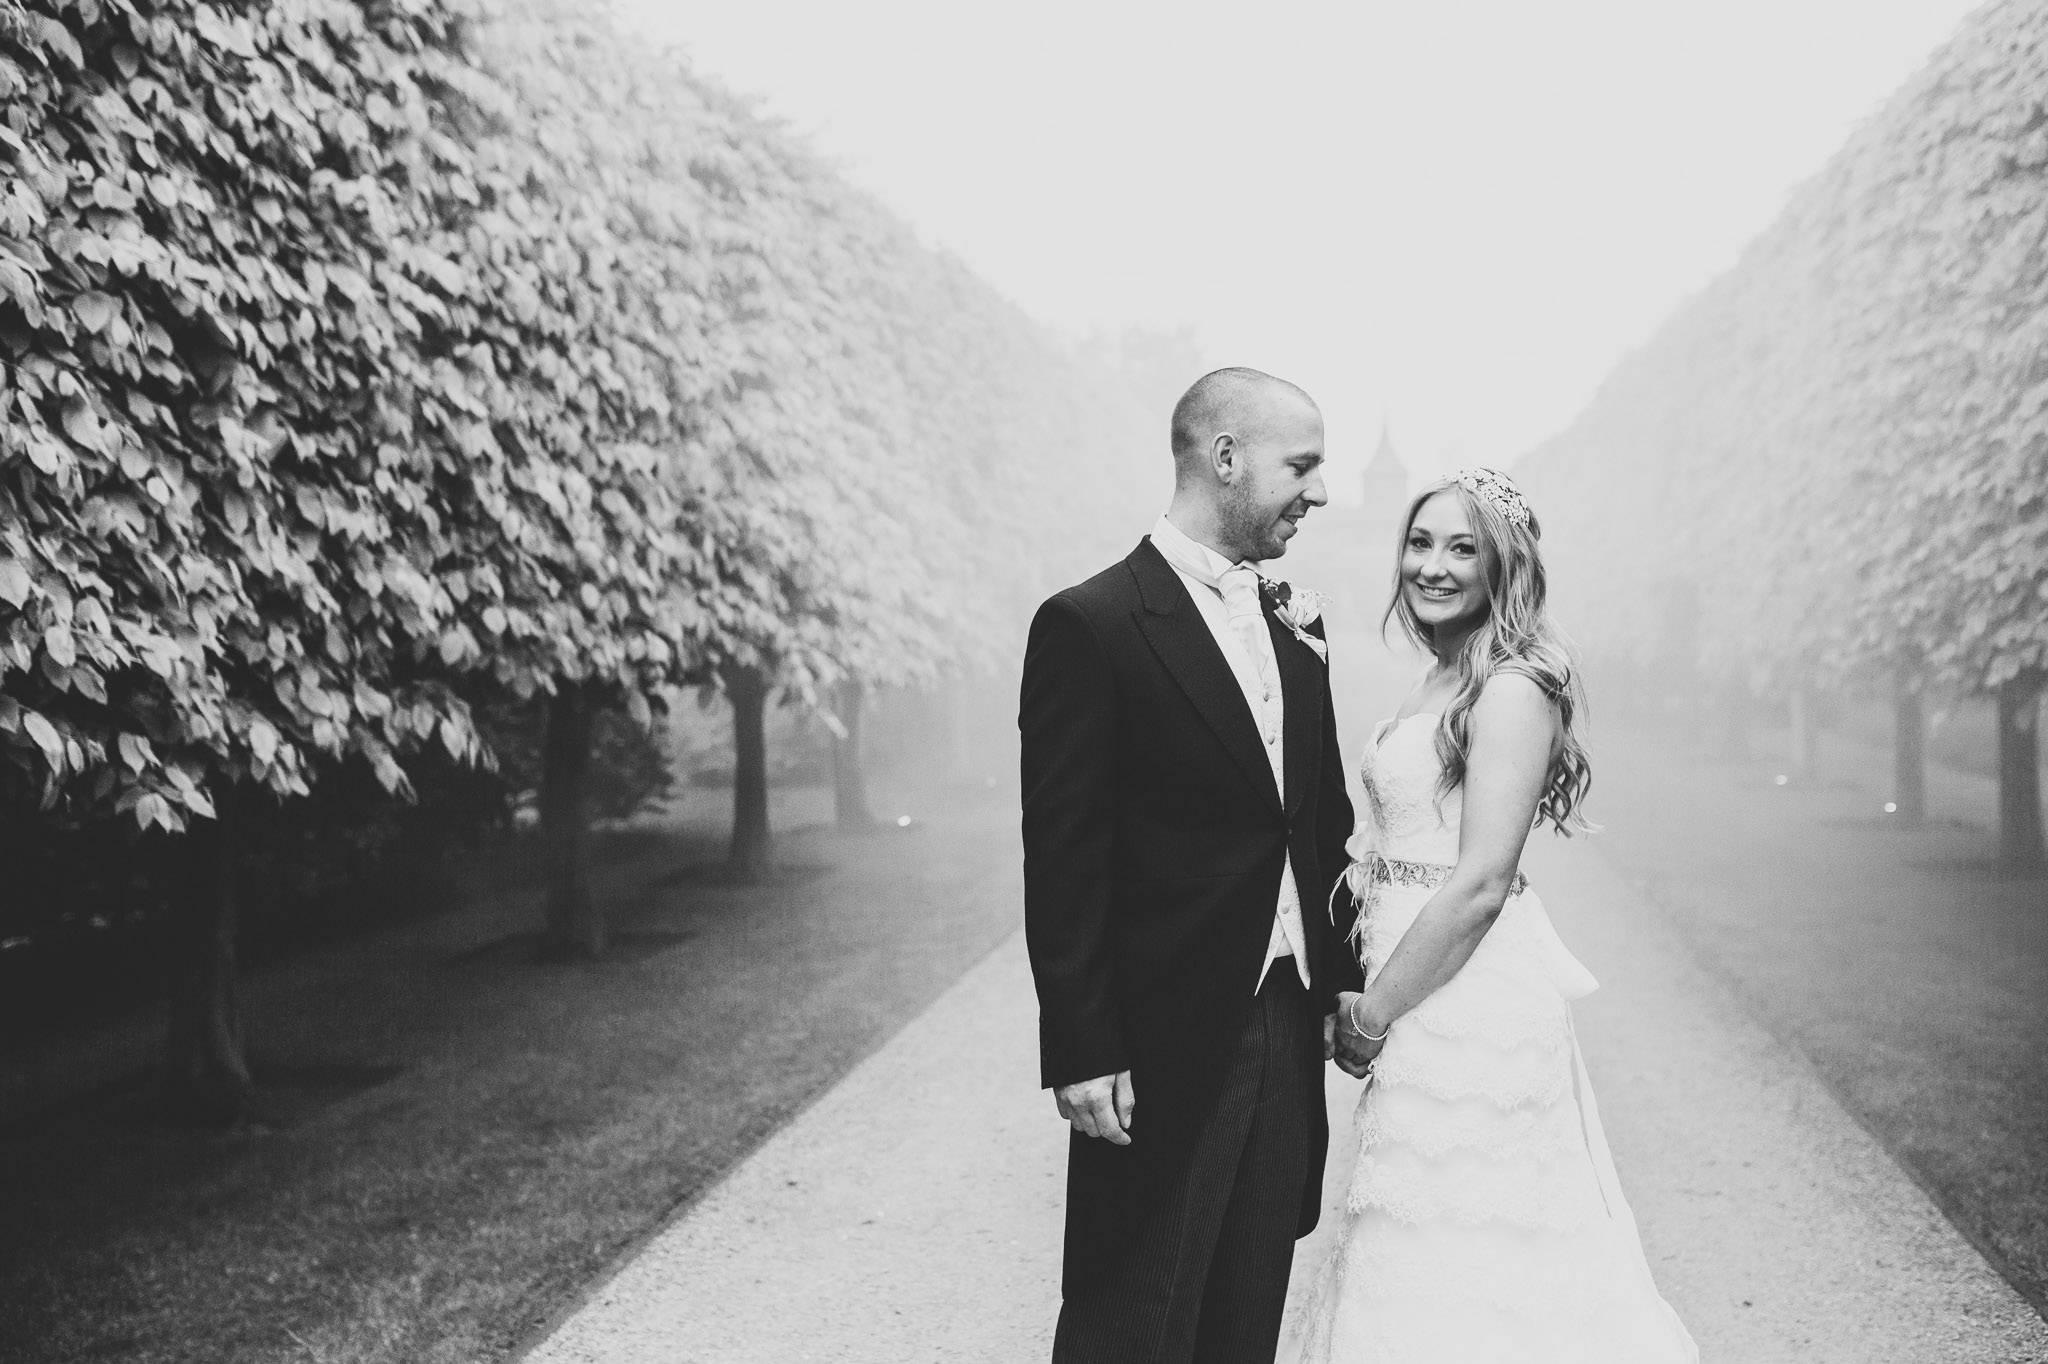 shropshire-wedding-photography 32.jpg